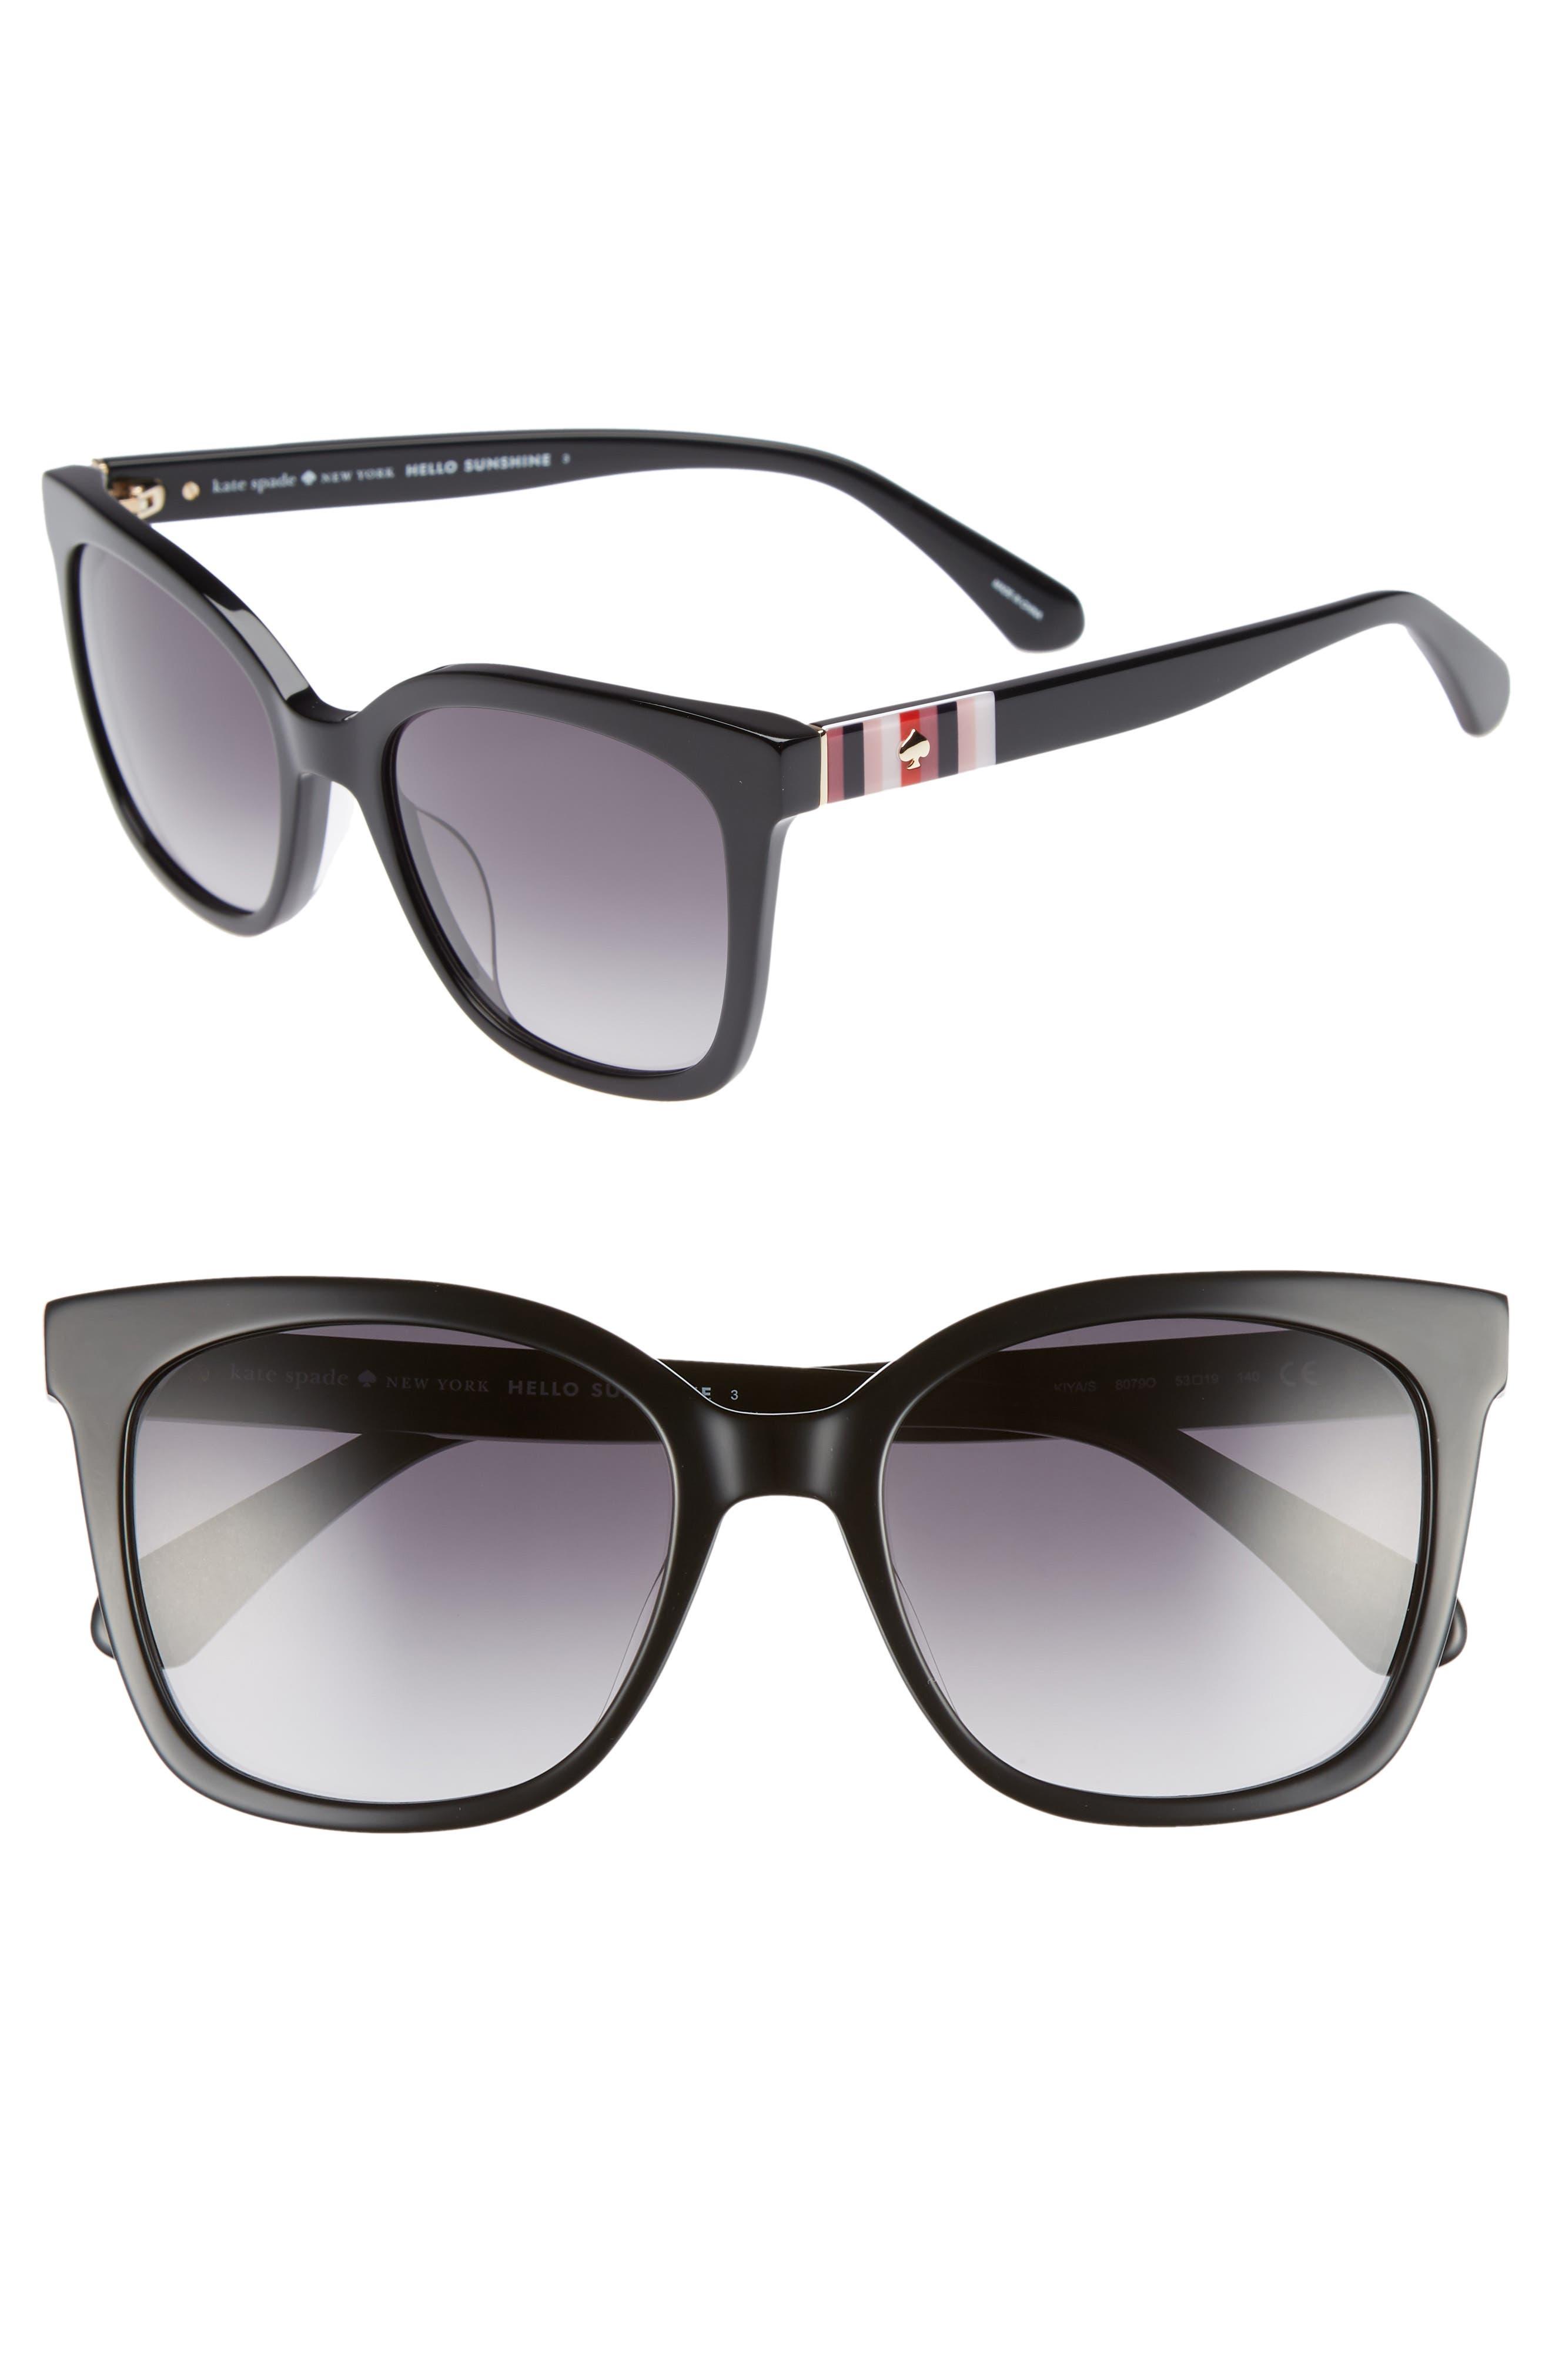 Kiyas Acetate Rectangle Sunglasses in Black